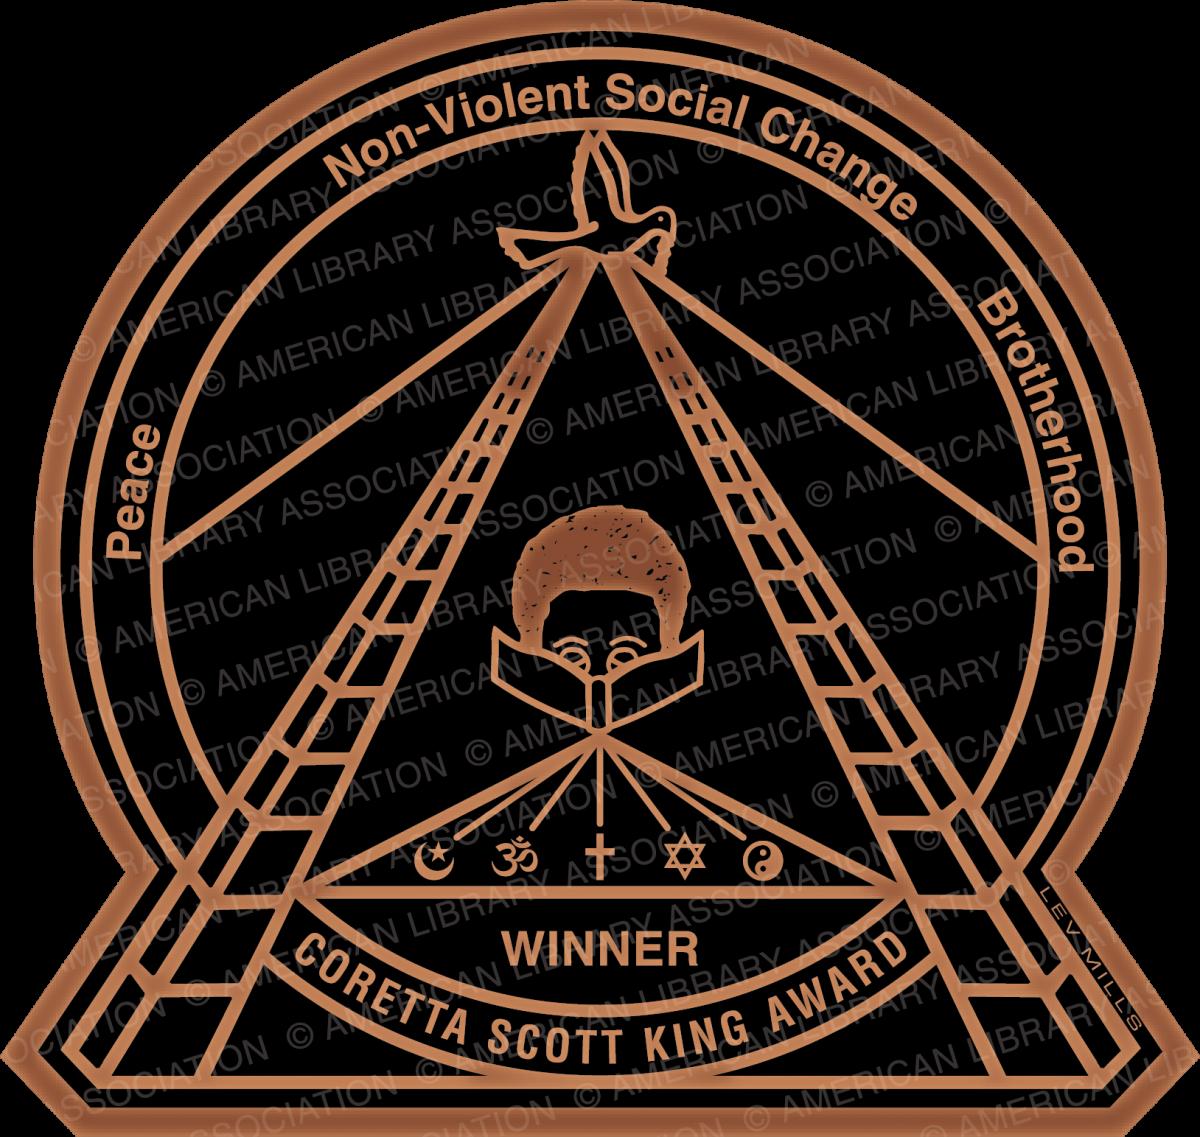 Coretta Scott King Book Awards logo